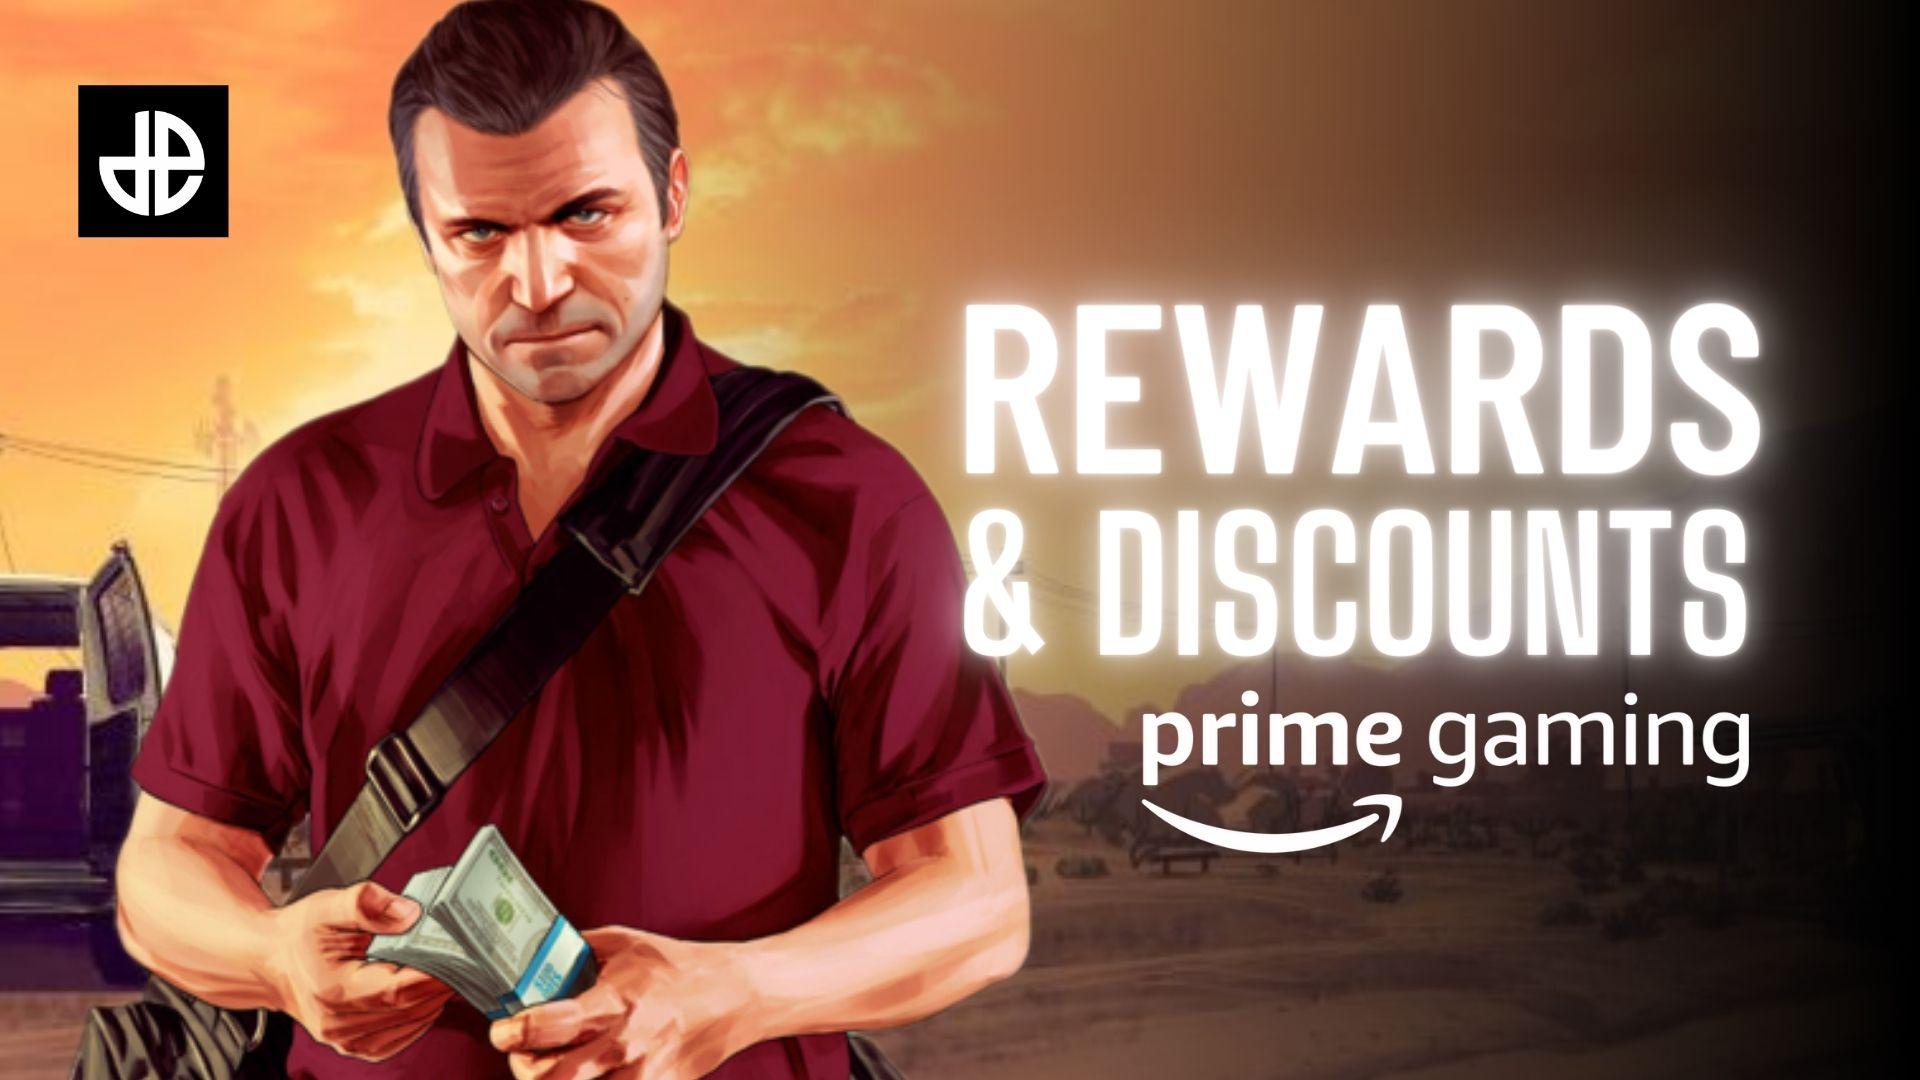 GTA Online Twitch Prime Gaming rewards